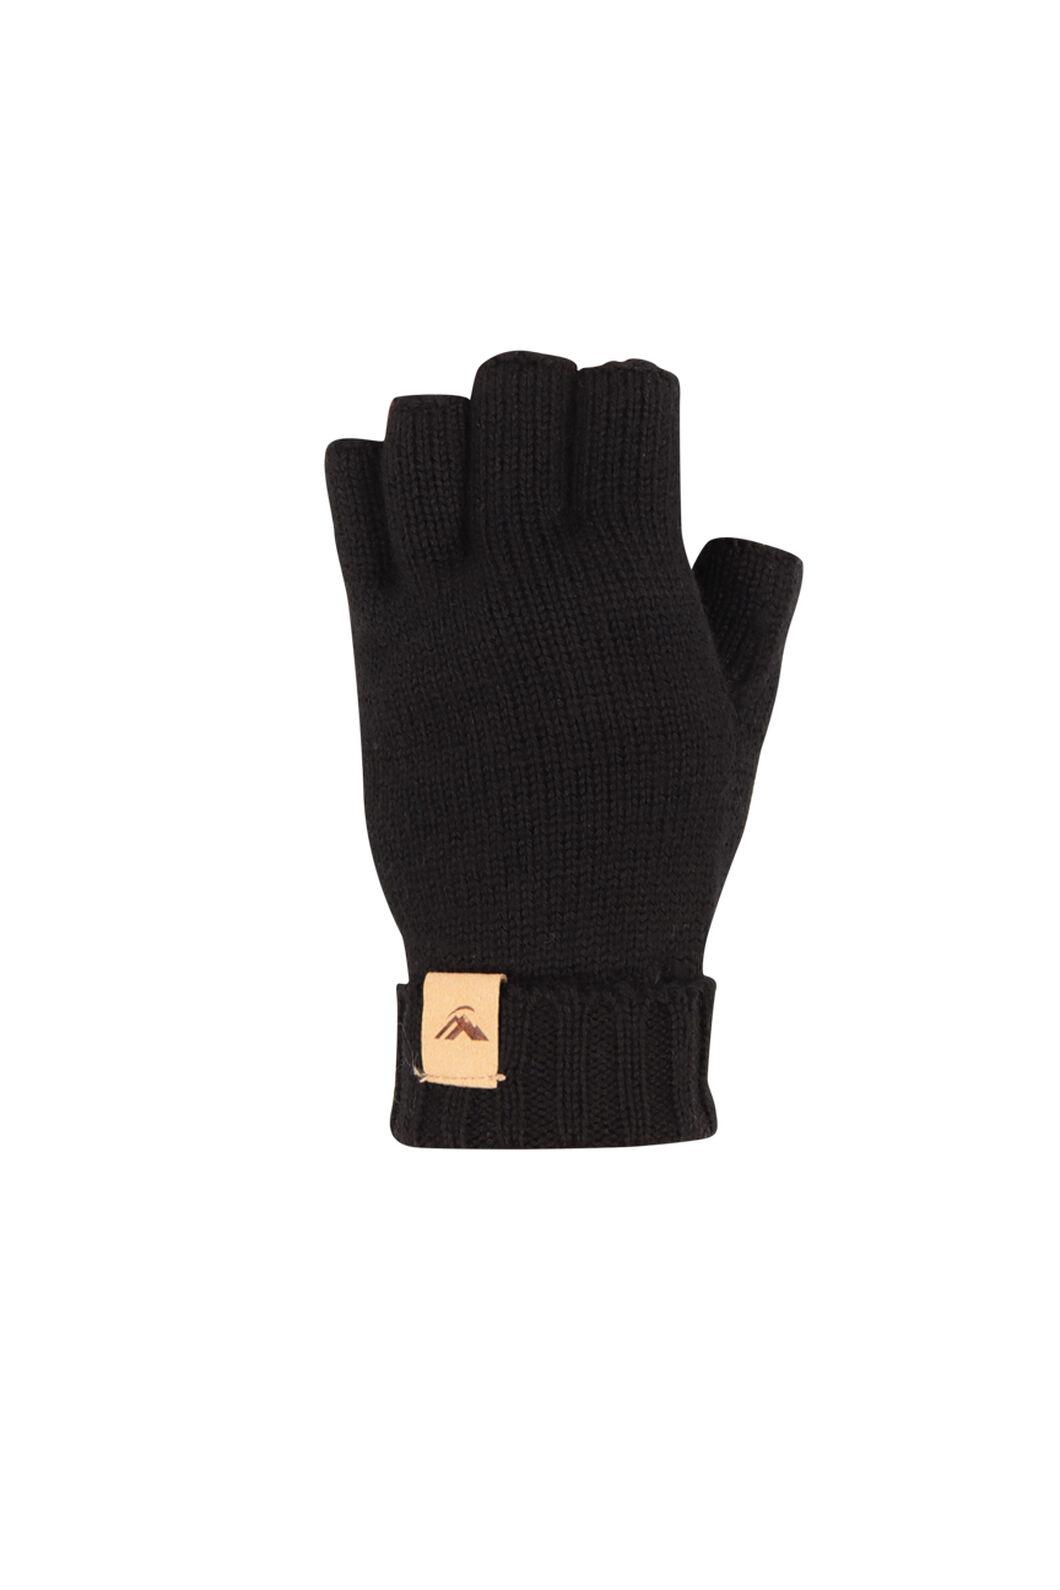 Macpac Merino Fingerless Gloves, Black, hi-res